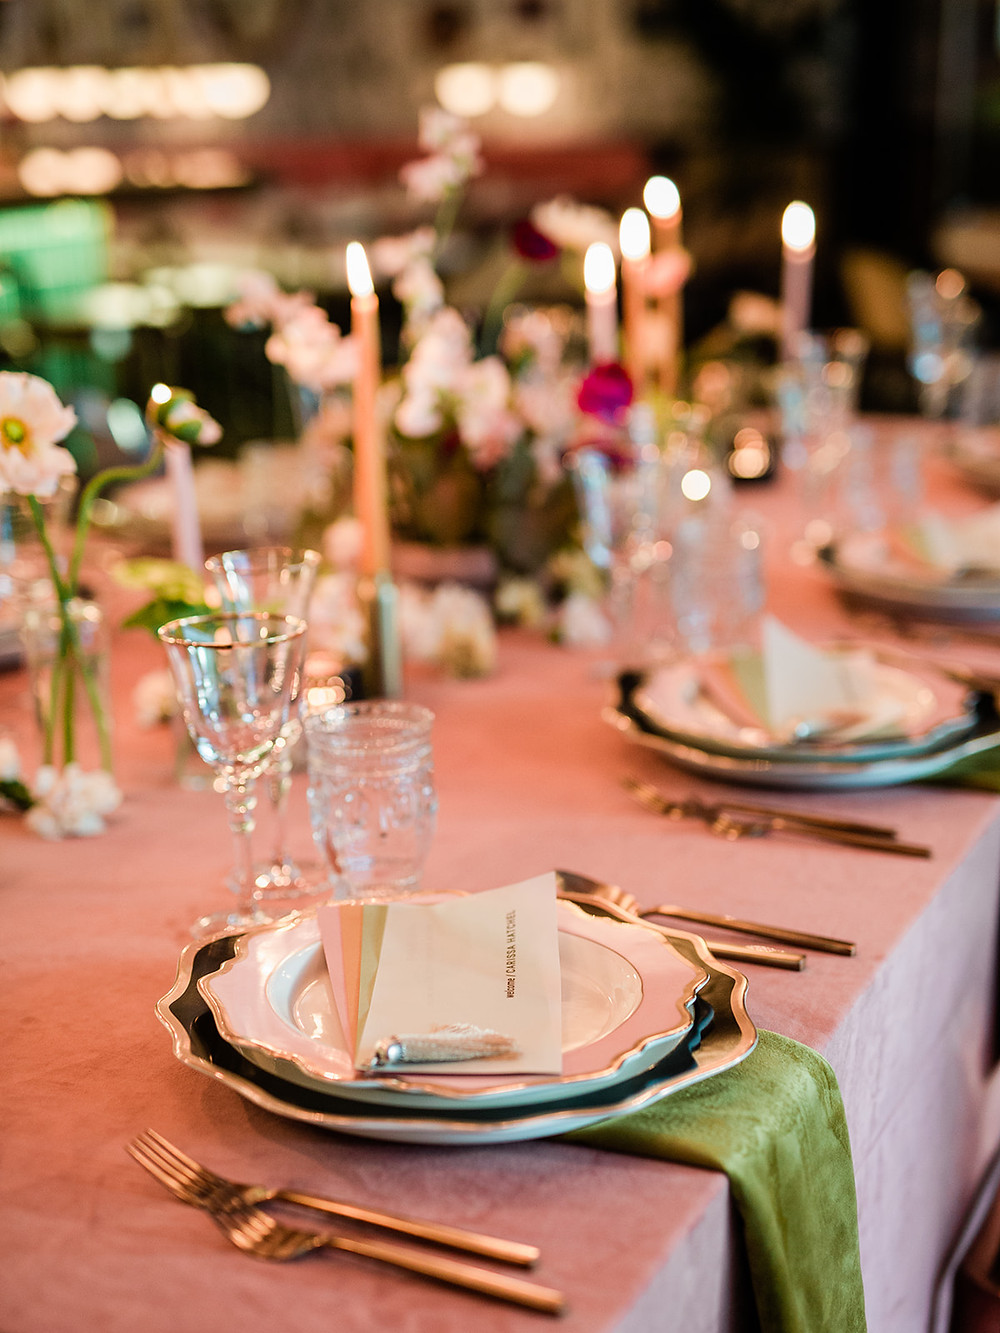 Modern Moroccan Desert Glam Editorial - LGBTQ Wedding Editoiral - Wedding Design Inspiration - Muted Desert Tones - Modern Glam Jungle Chic - table top dinner design